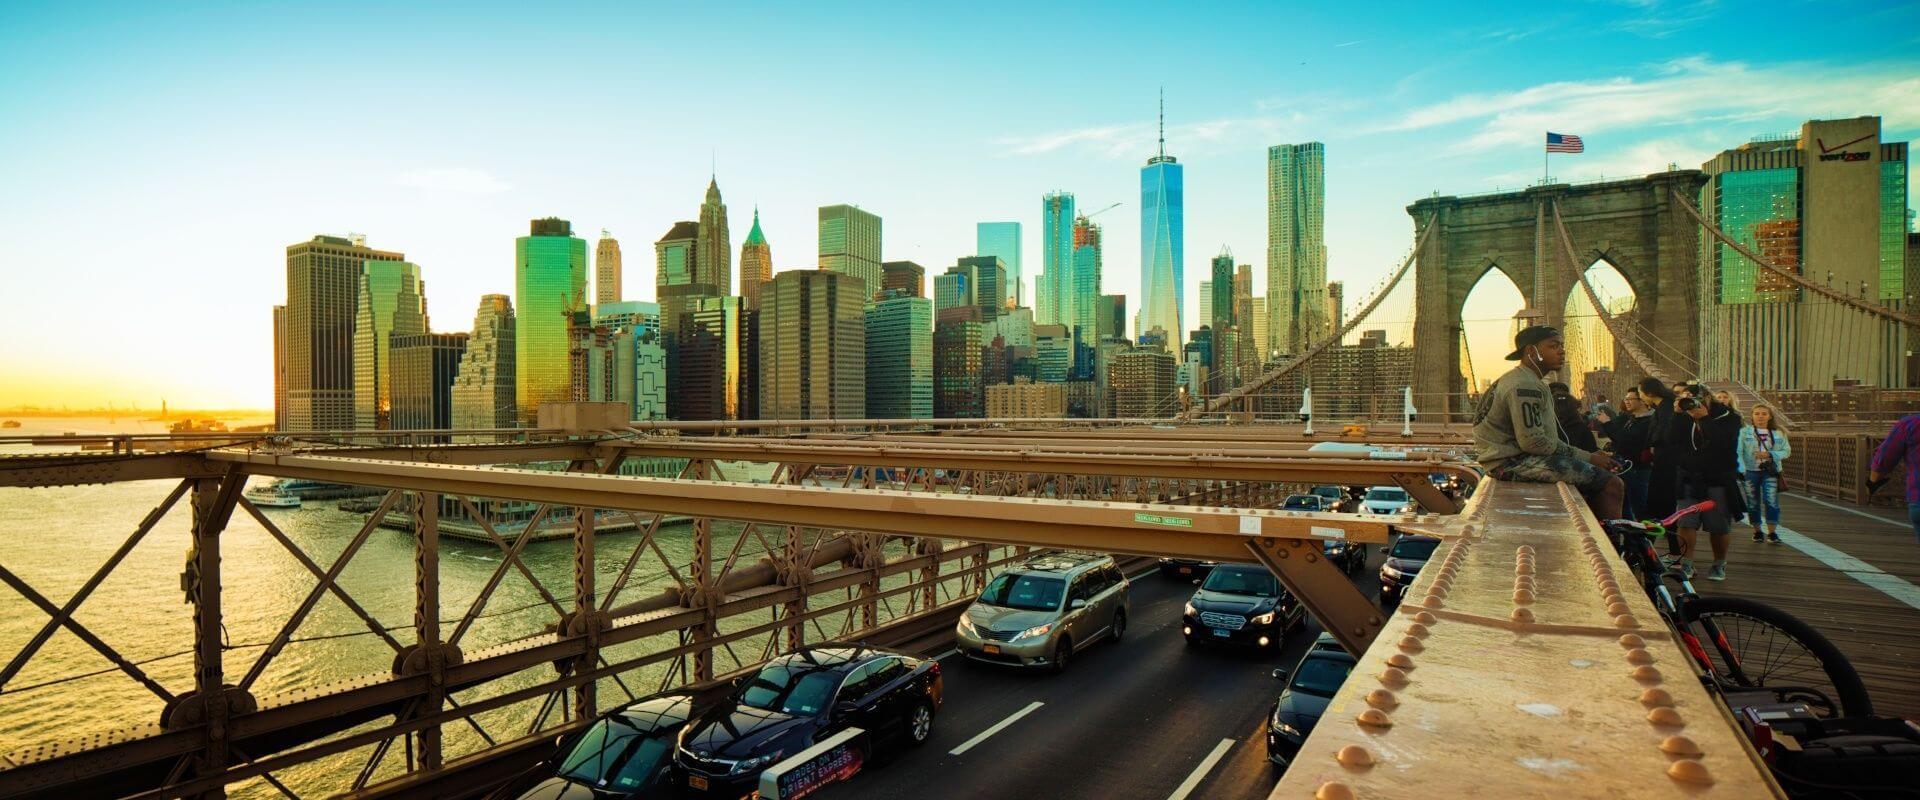 new-york-city-portrait-blog.jpg